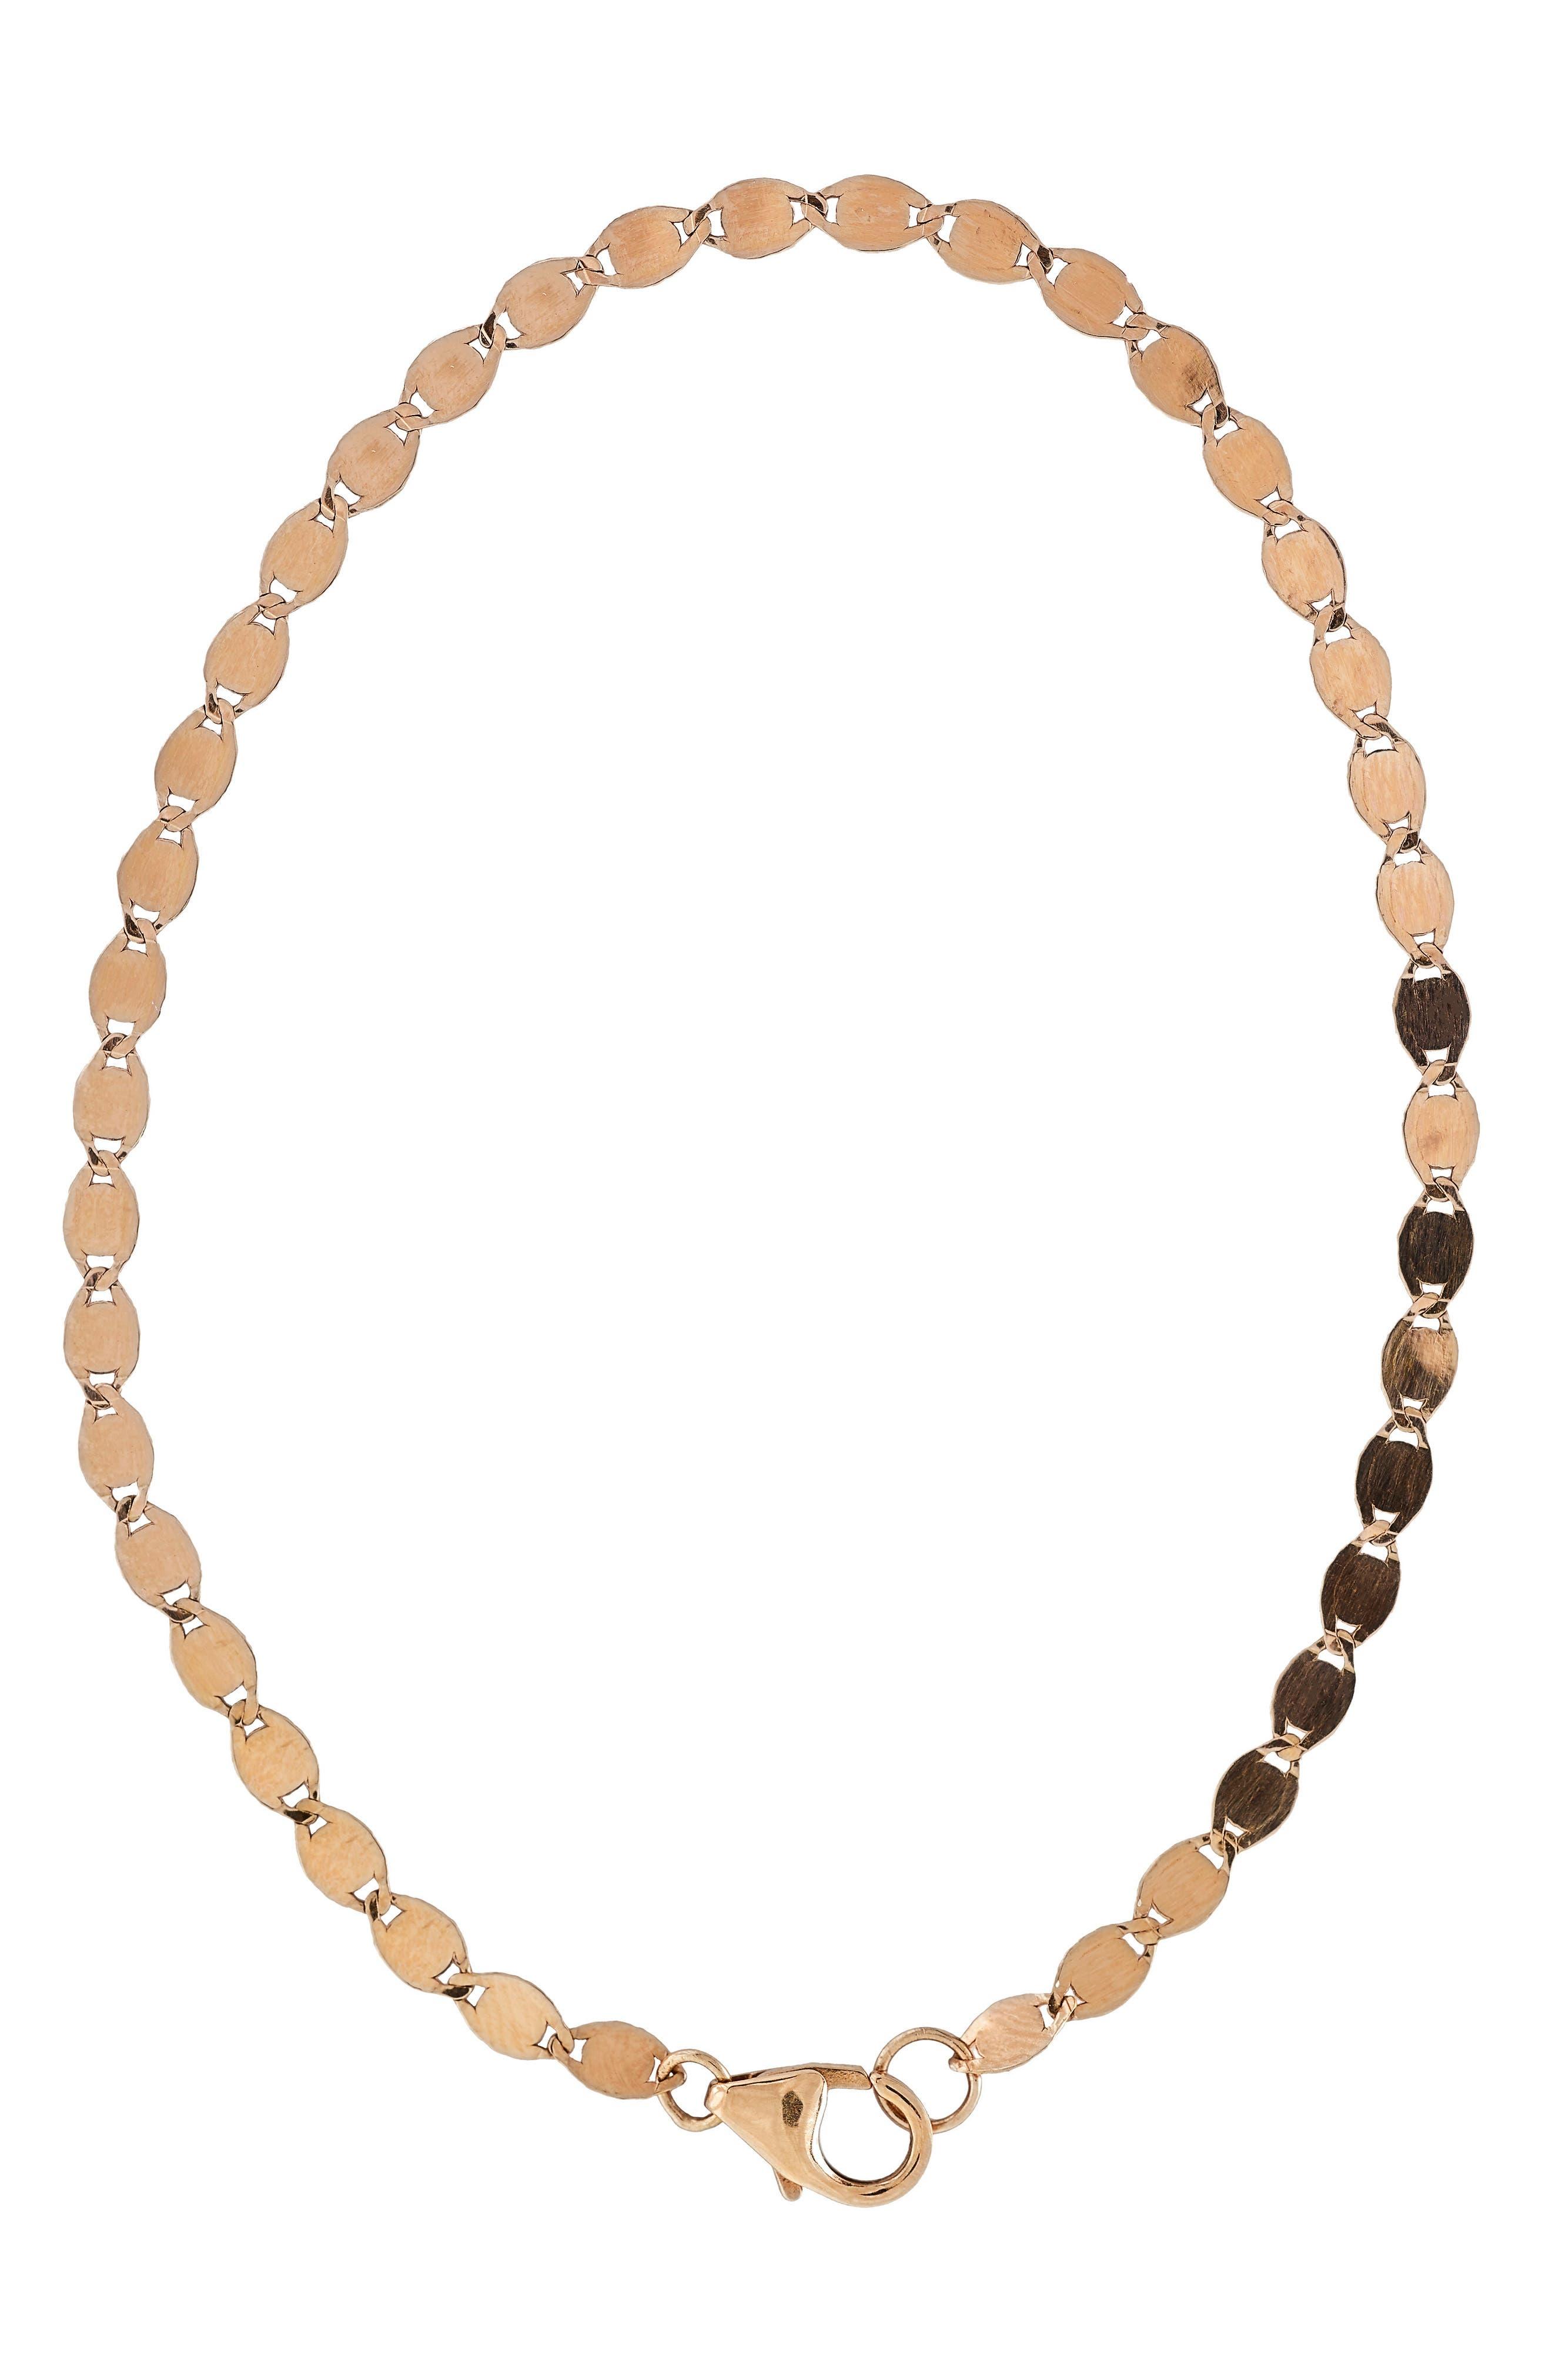 Main Image - Lana Jewelry Nude Link Bracelet